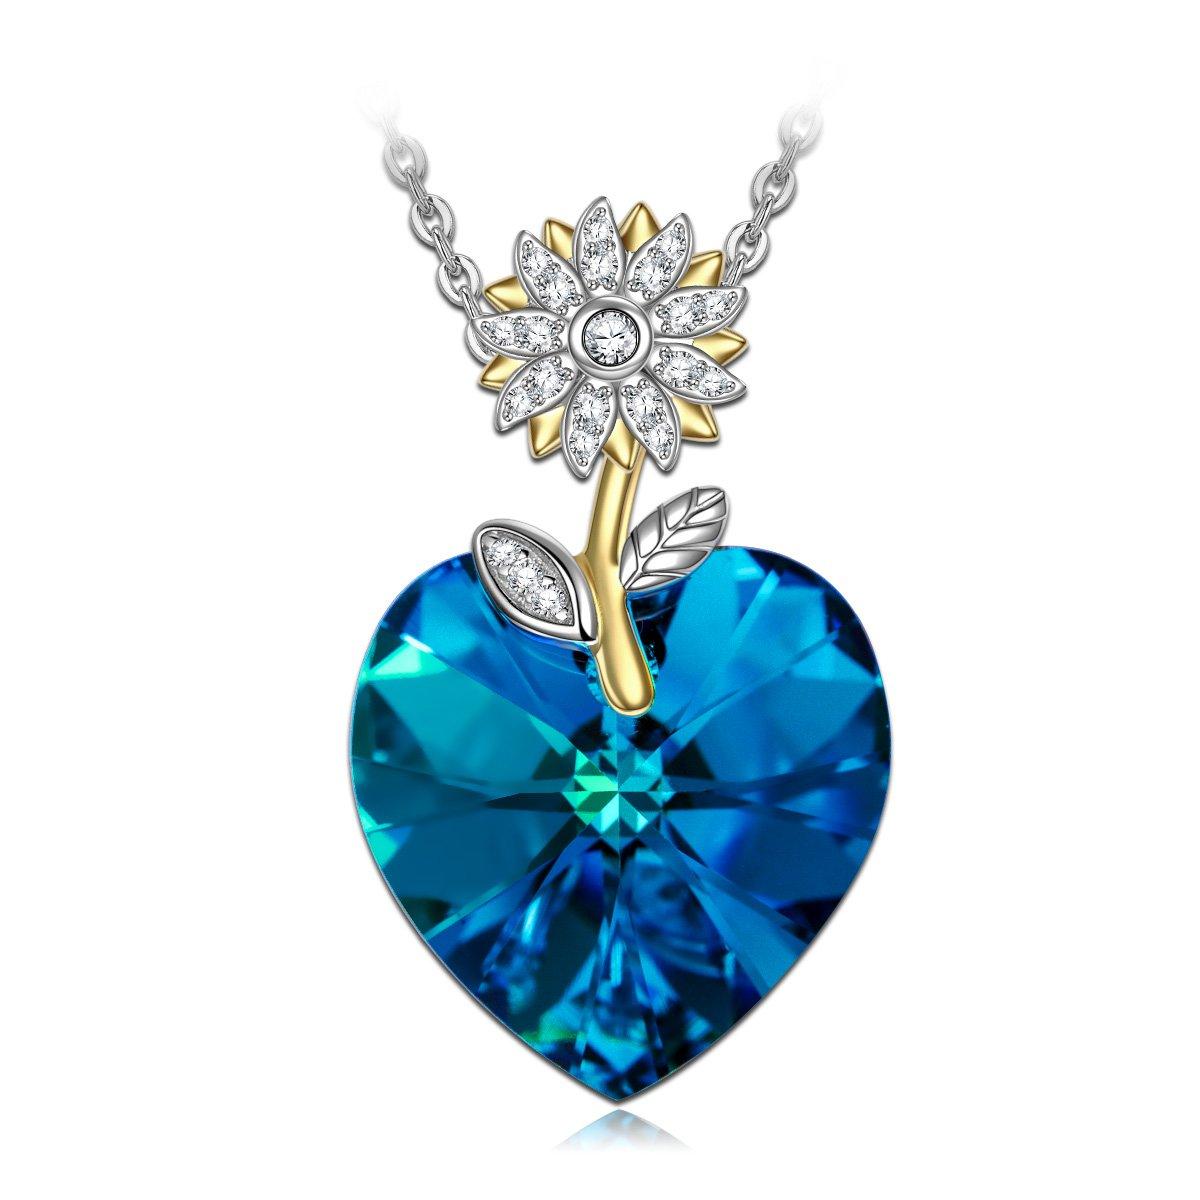 Alex Perry Regalos para San Valentín, Serie Mundo Hermoso, Collar de Mujer, Plata de Ley 925, Cristal de Azul de Swarovski, Exquisita Caja de Regalo